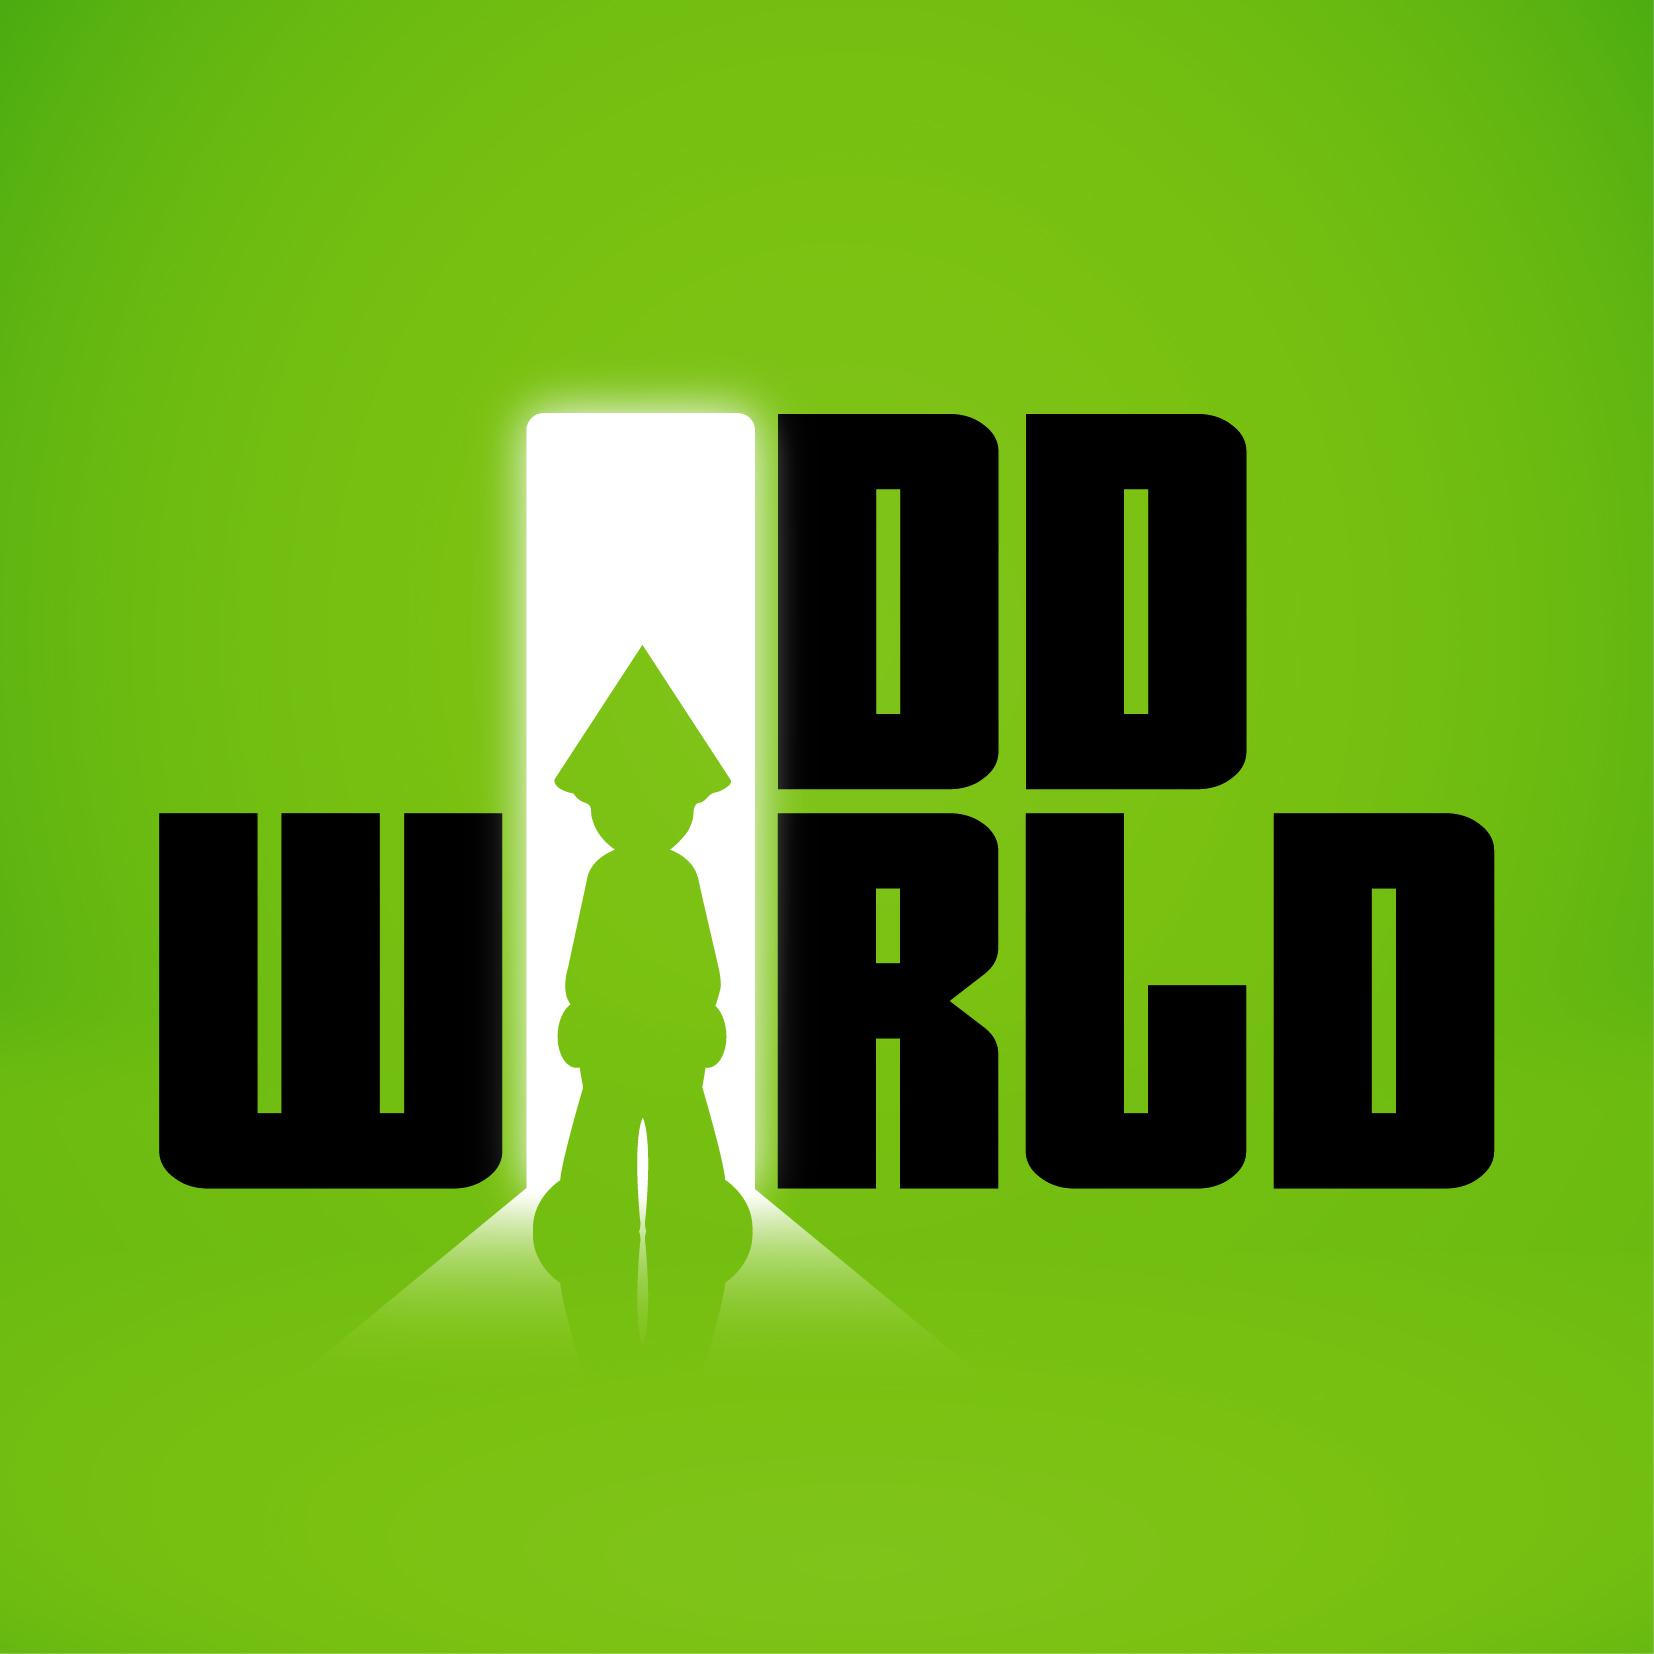 oddworld.jpg